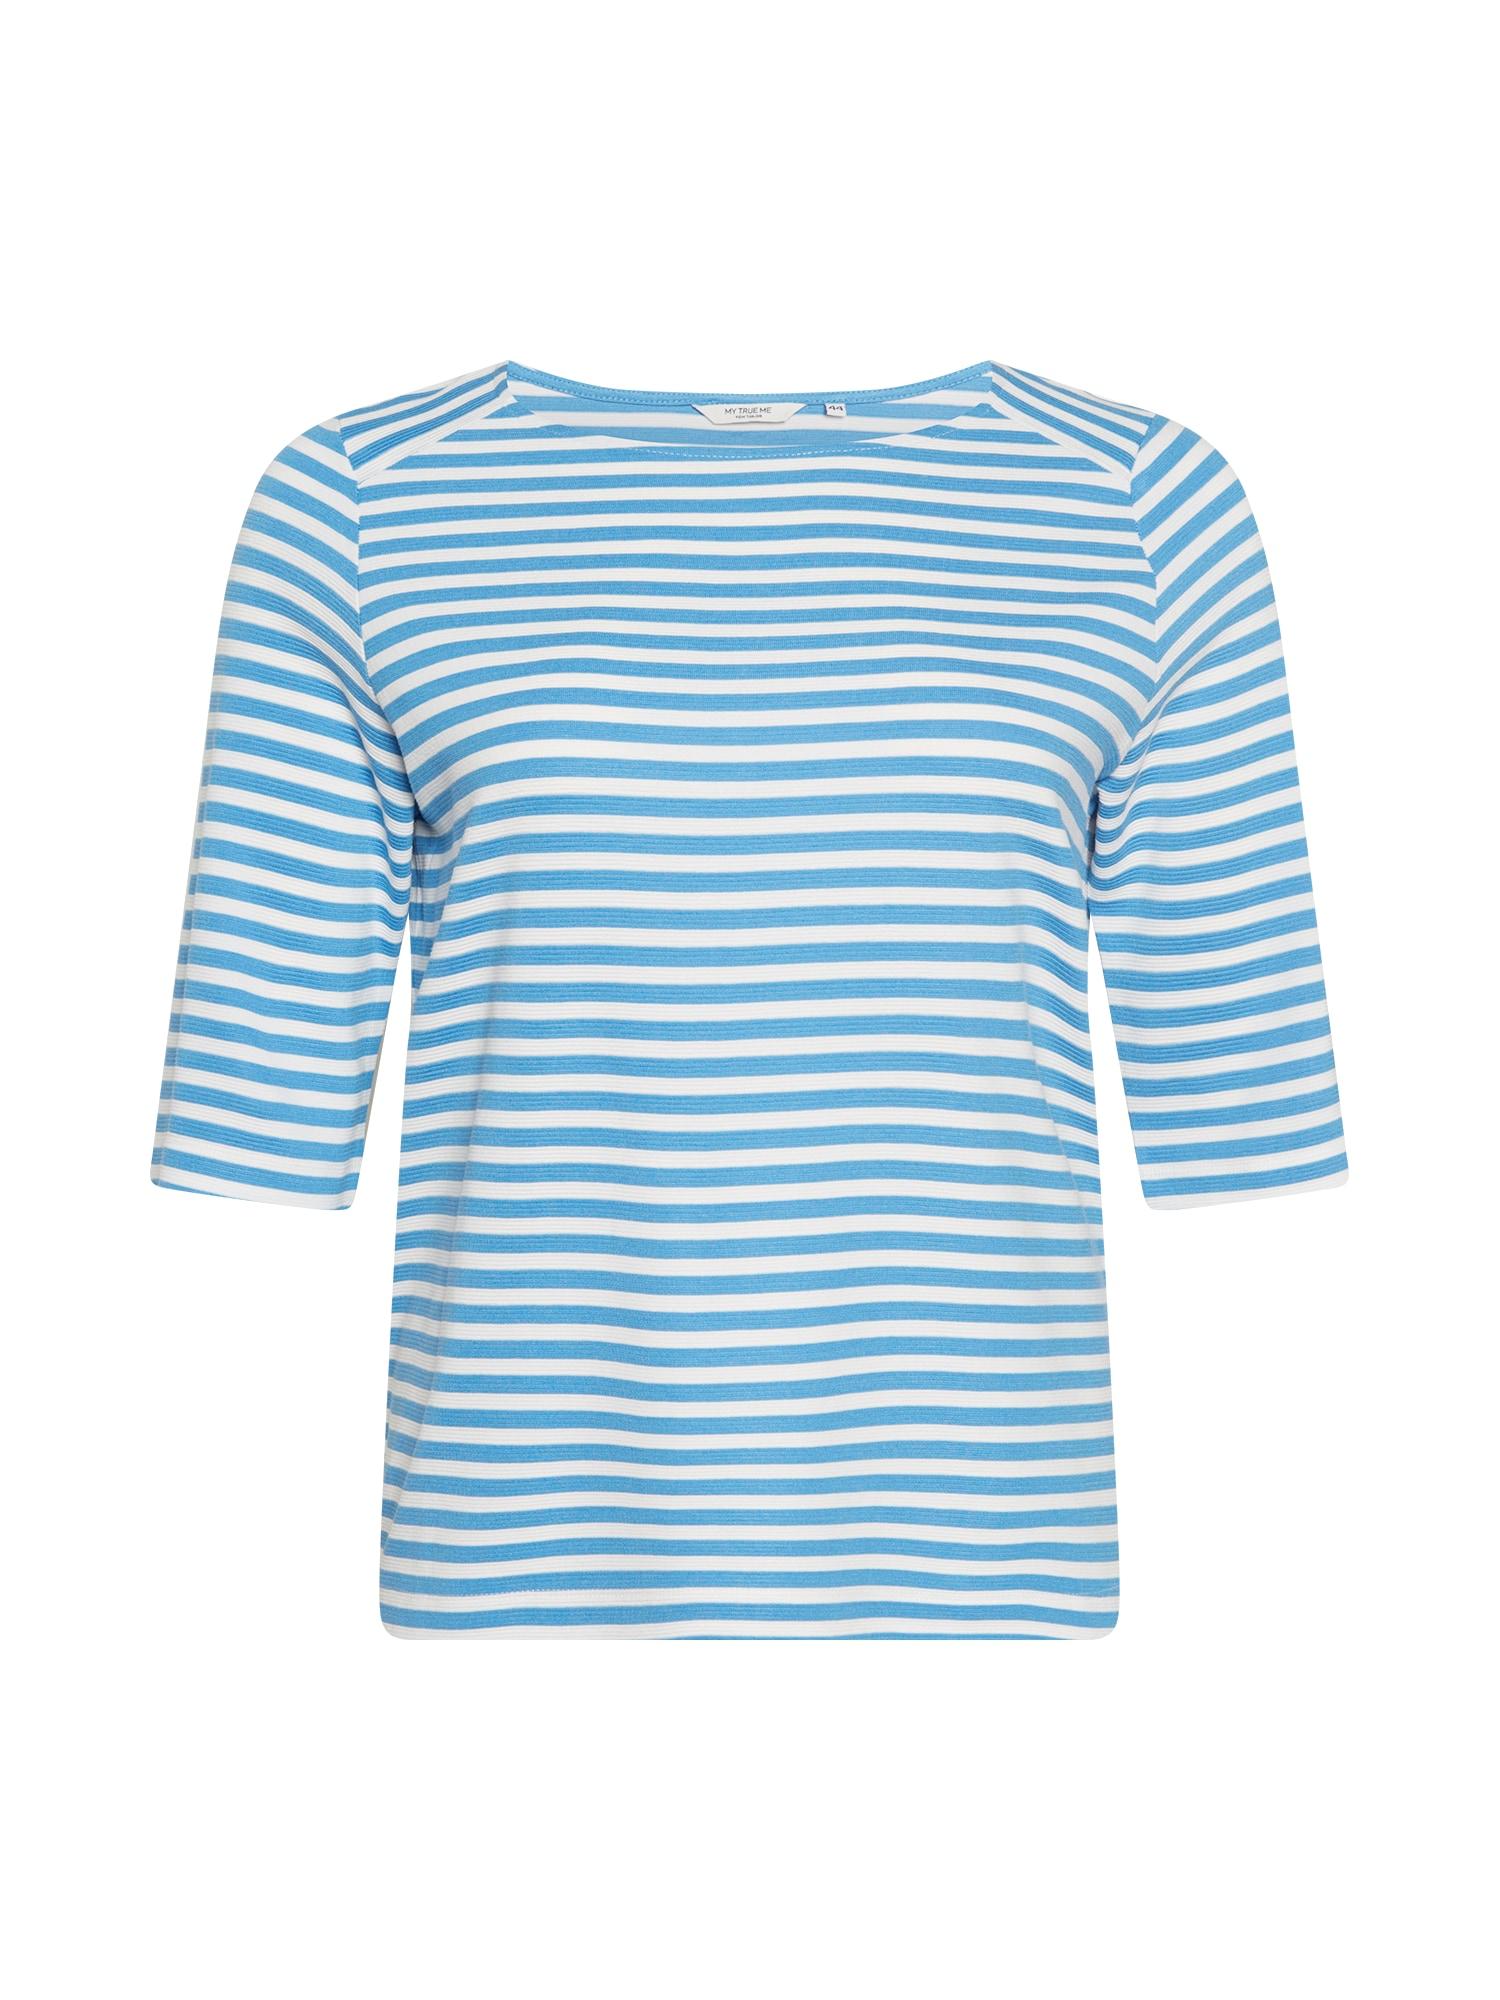 MY TRUE ME Marškinėliai mėlyna / balta